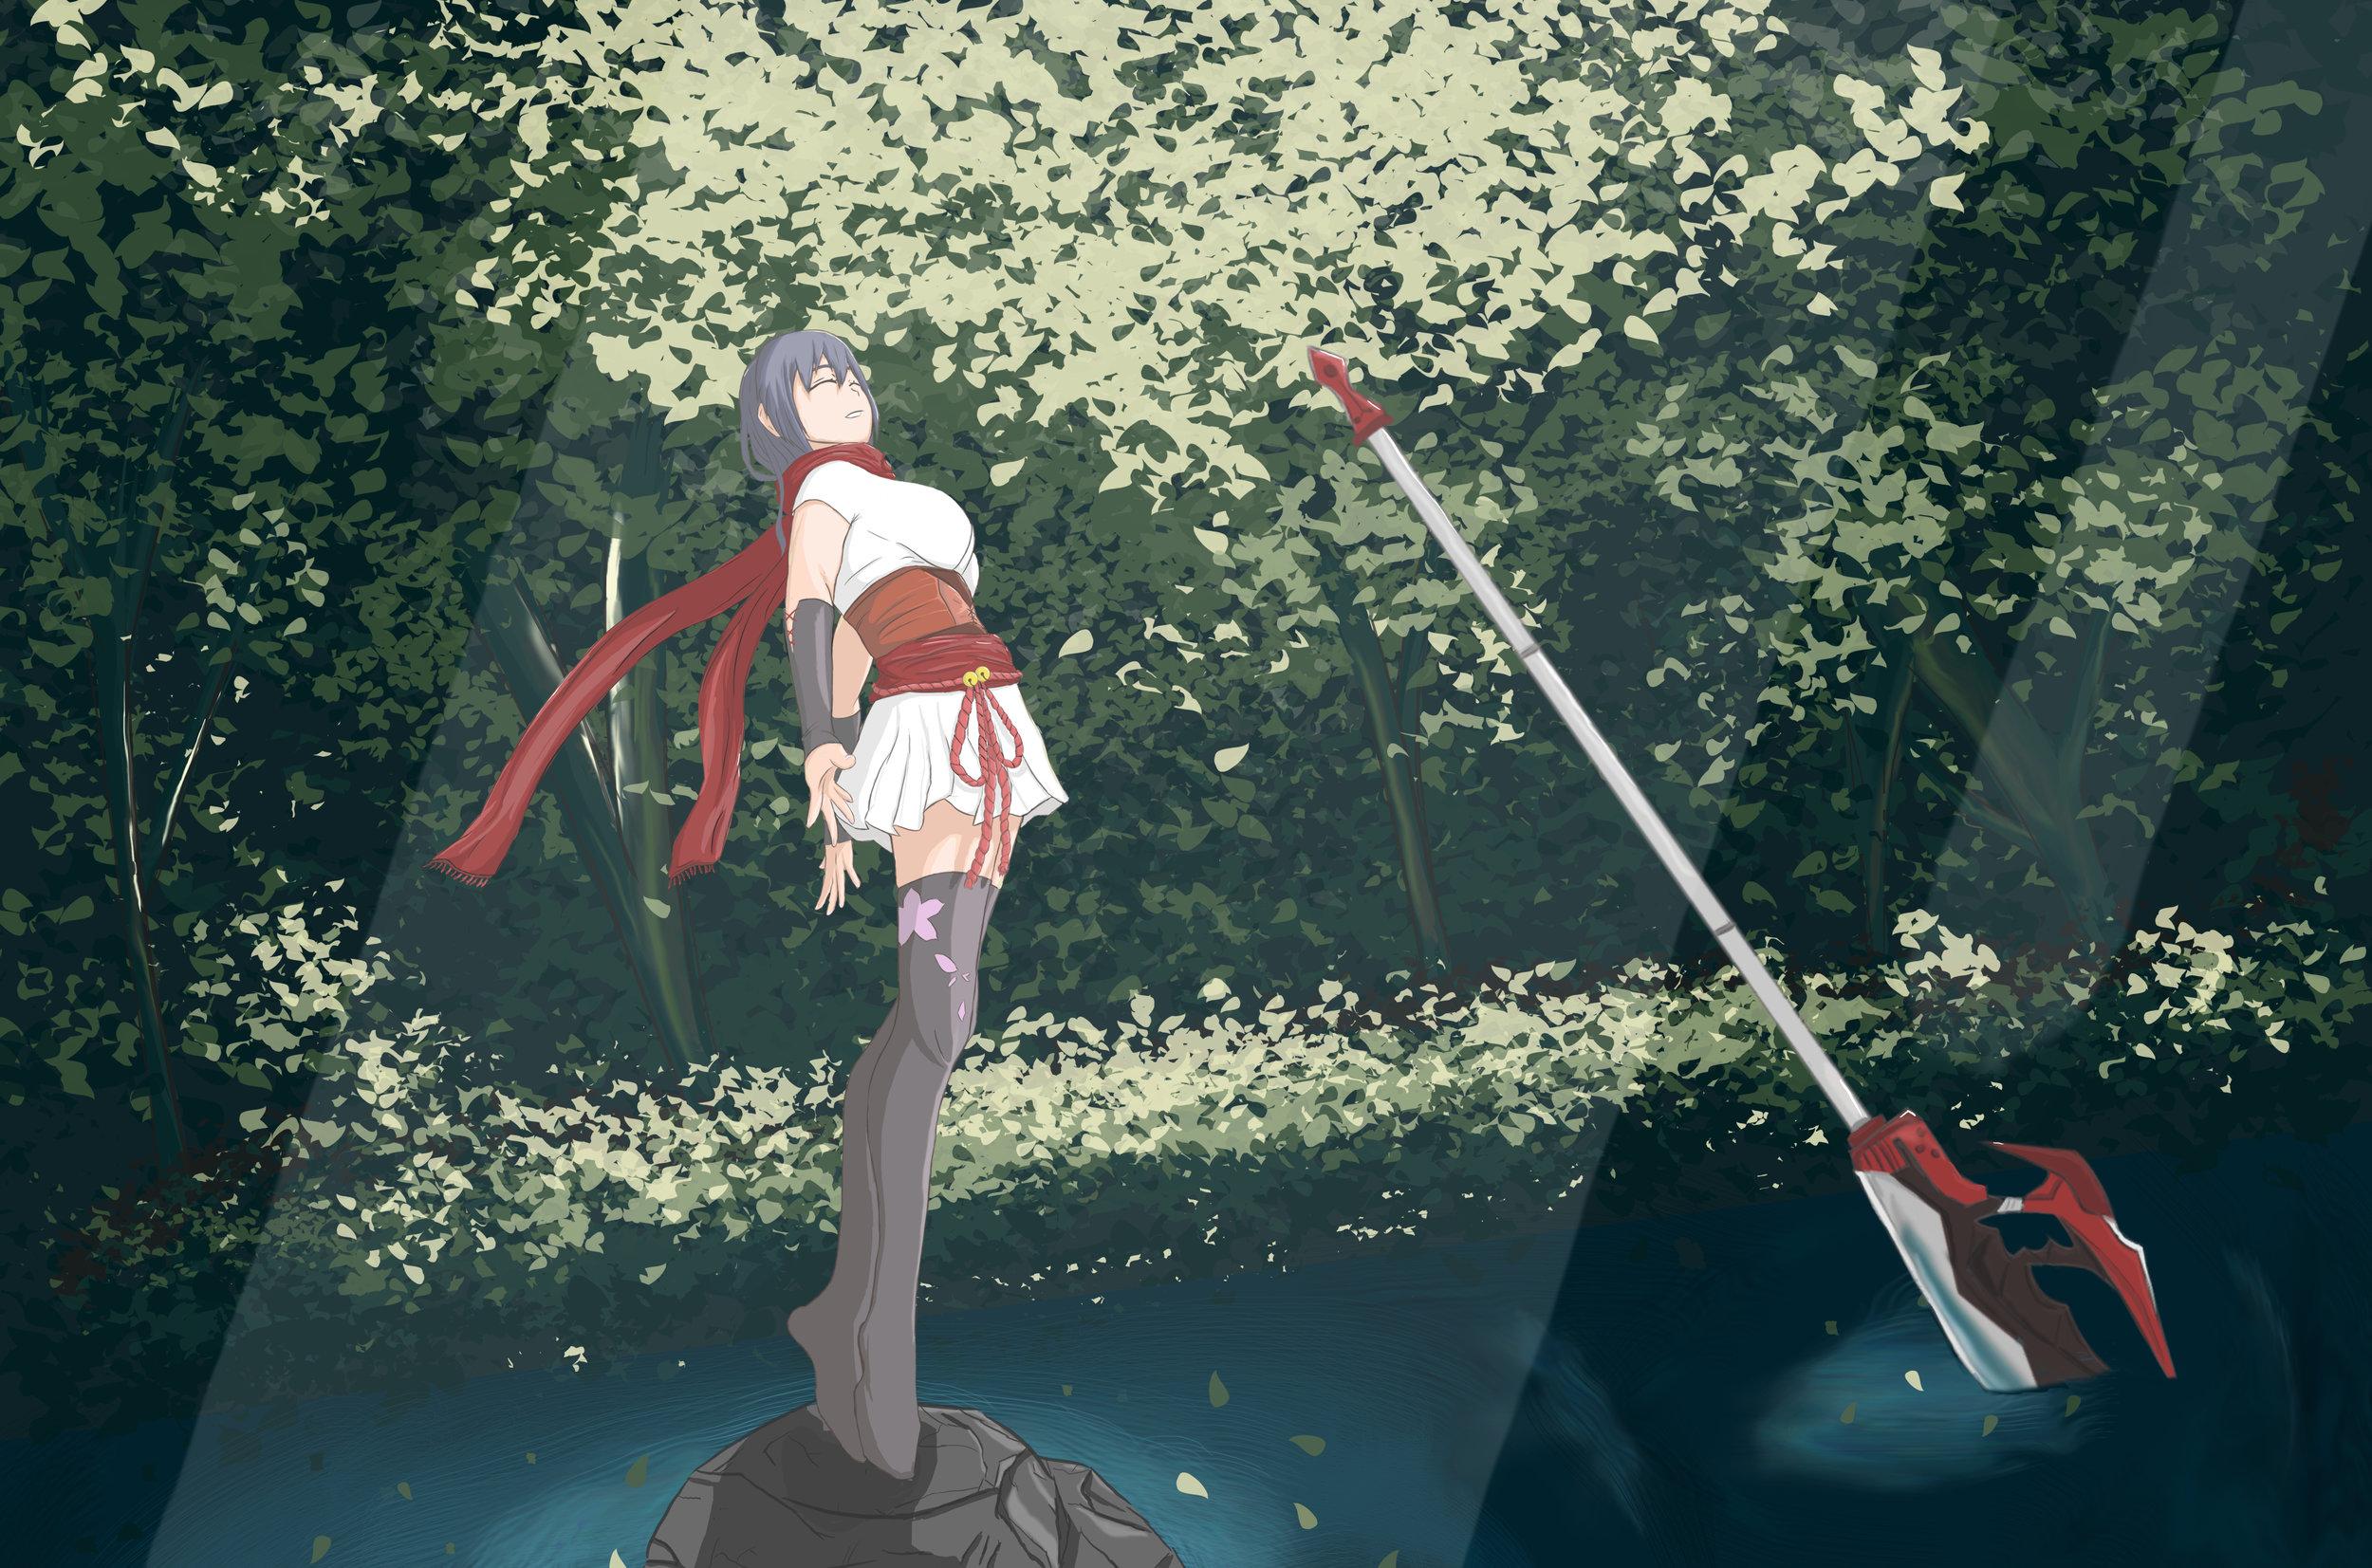 Flower Girl by Ricky Wu